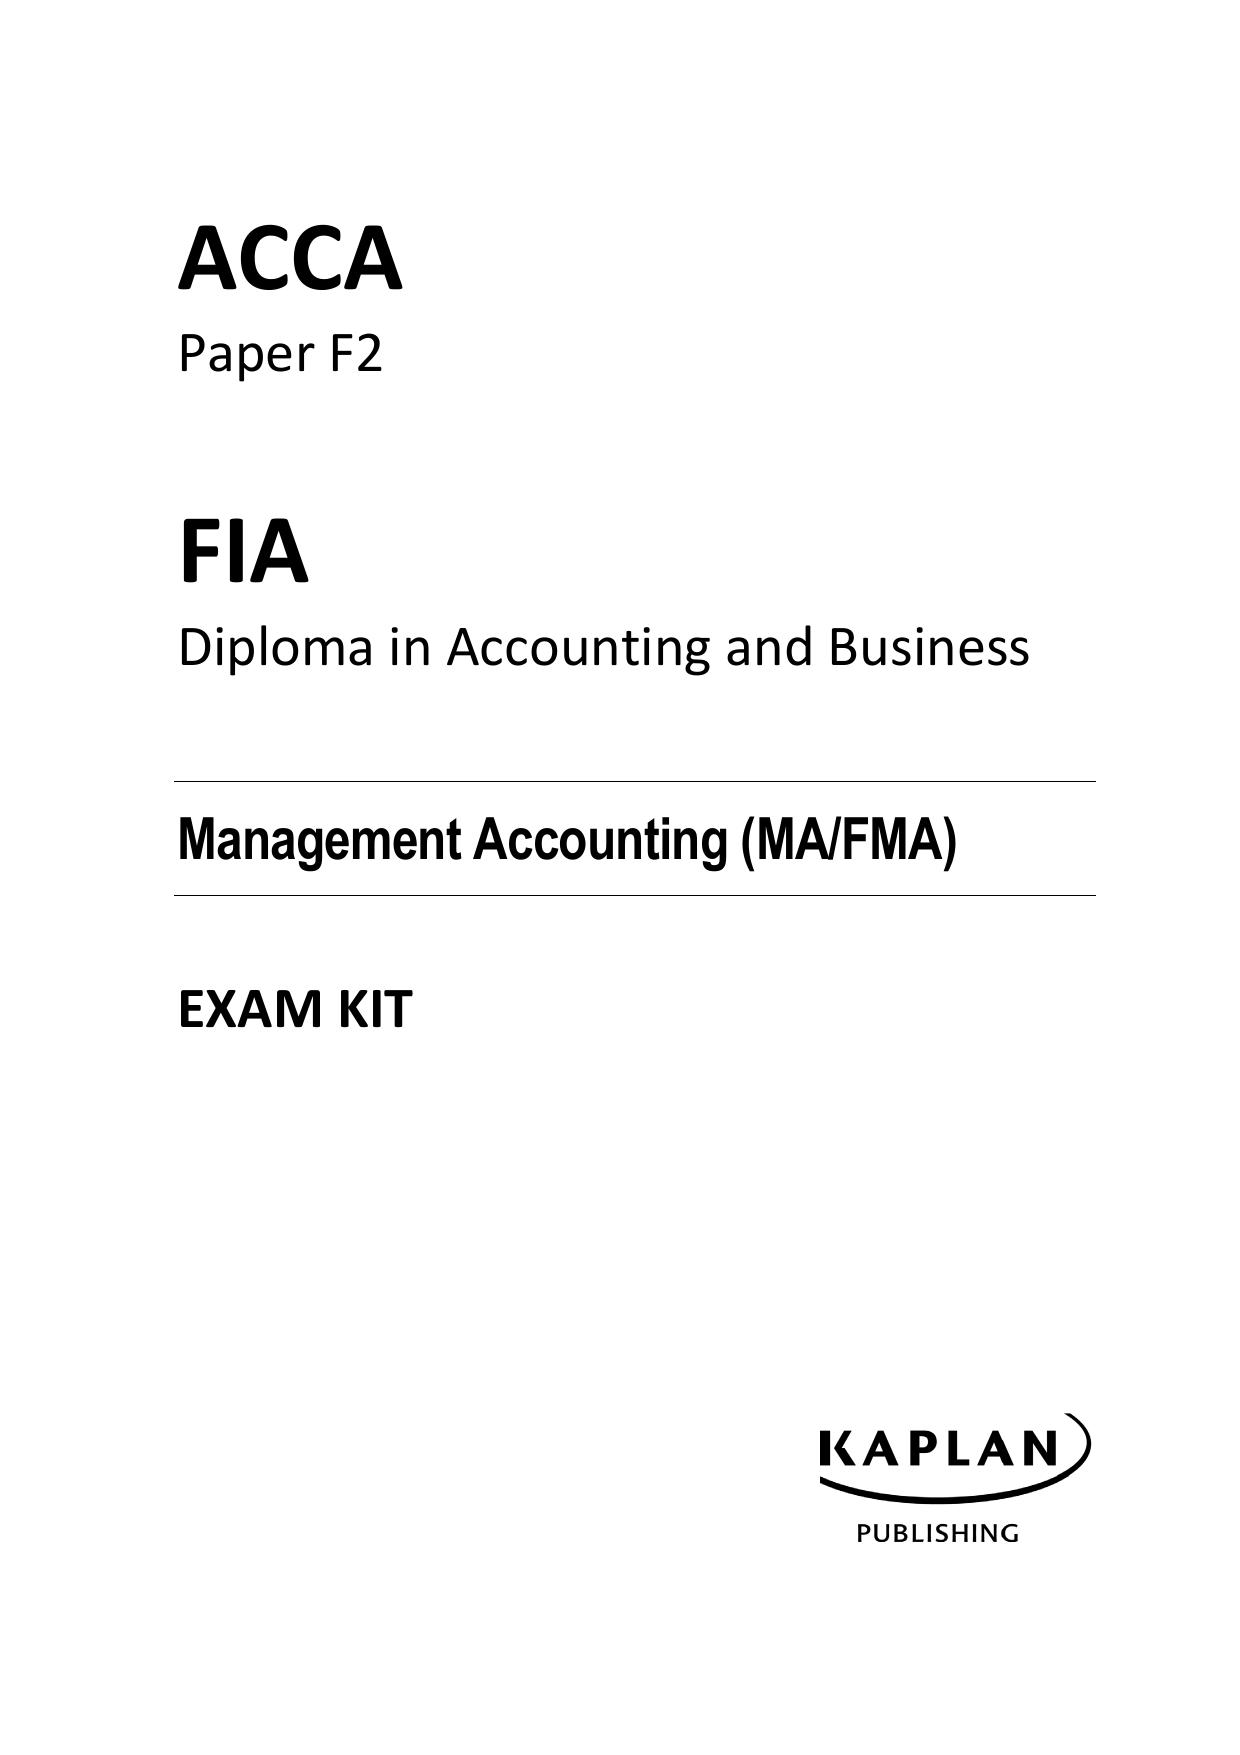 ACCA-F2-answ